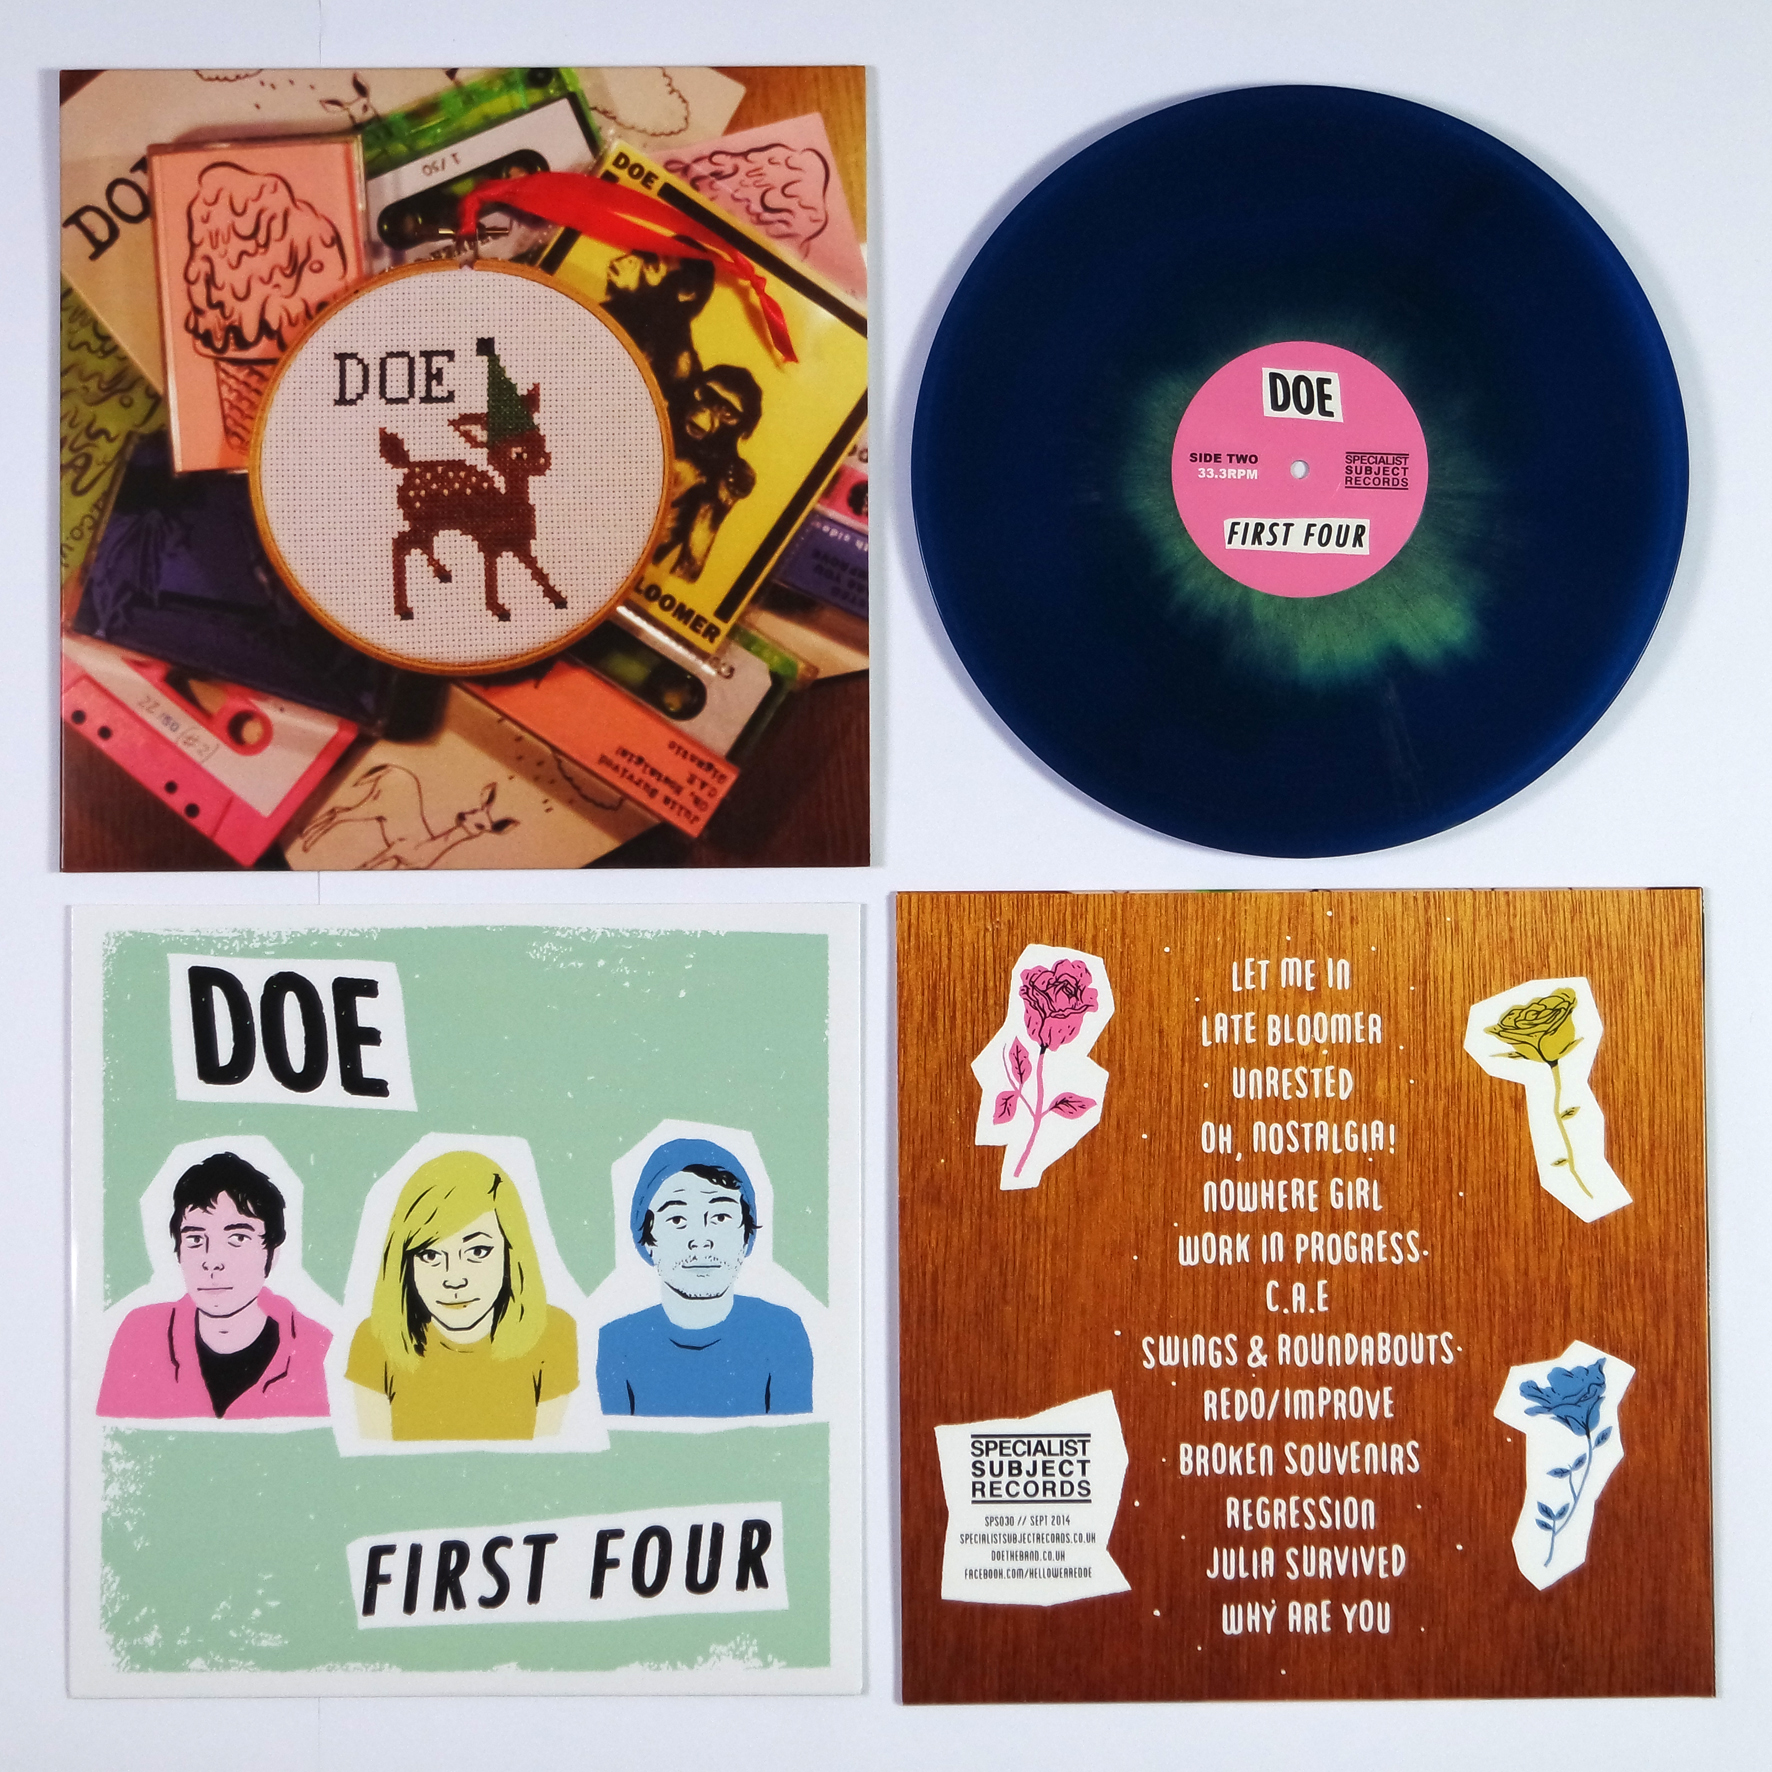 Doe - First Four LP